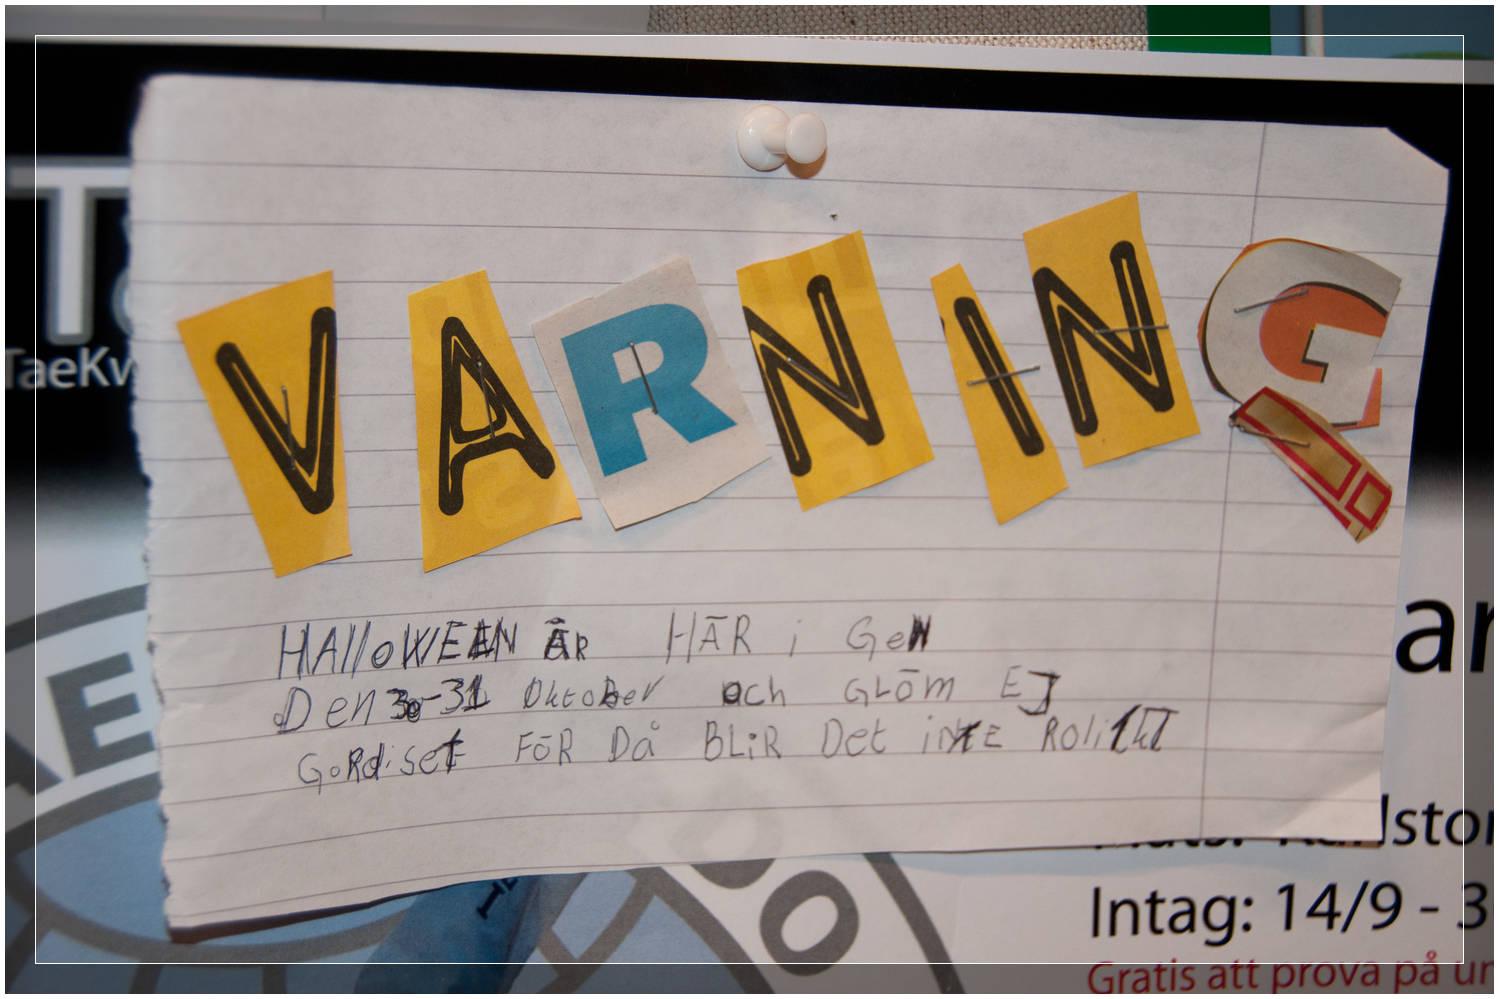 Halloween Warning - Trollhattan Sweden (c) Dustin Main